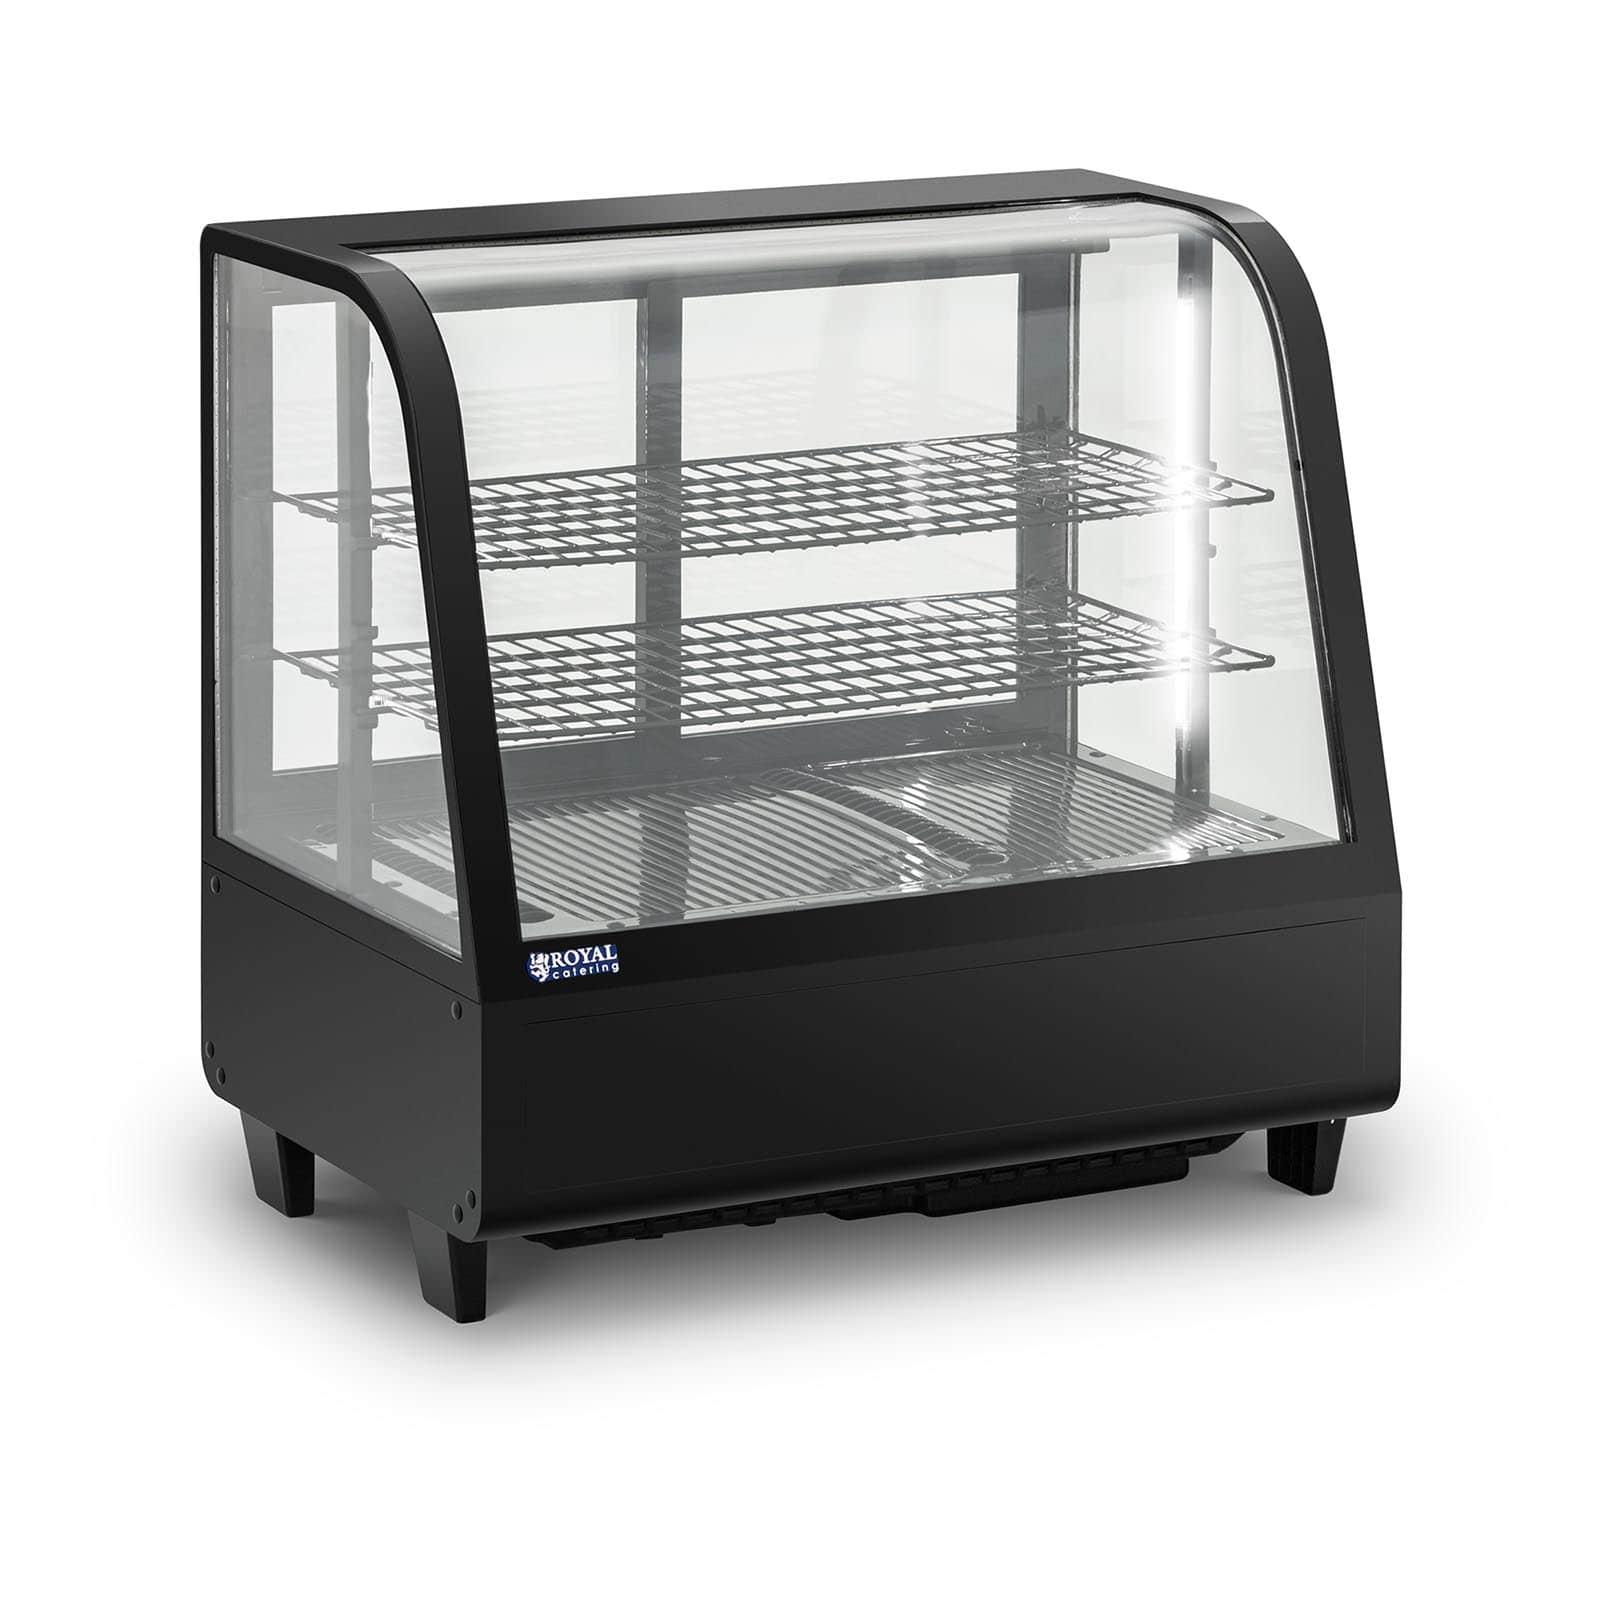 Display fridges